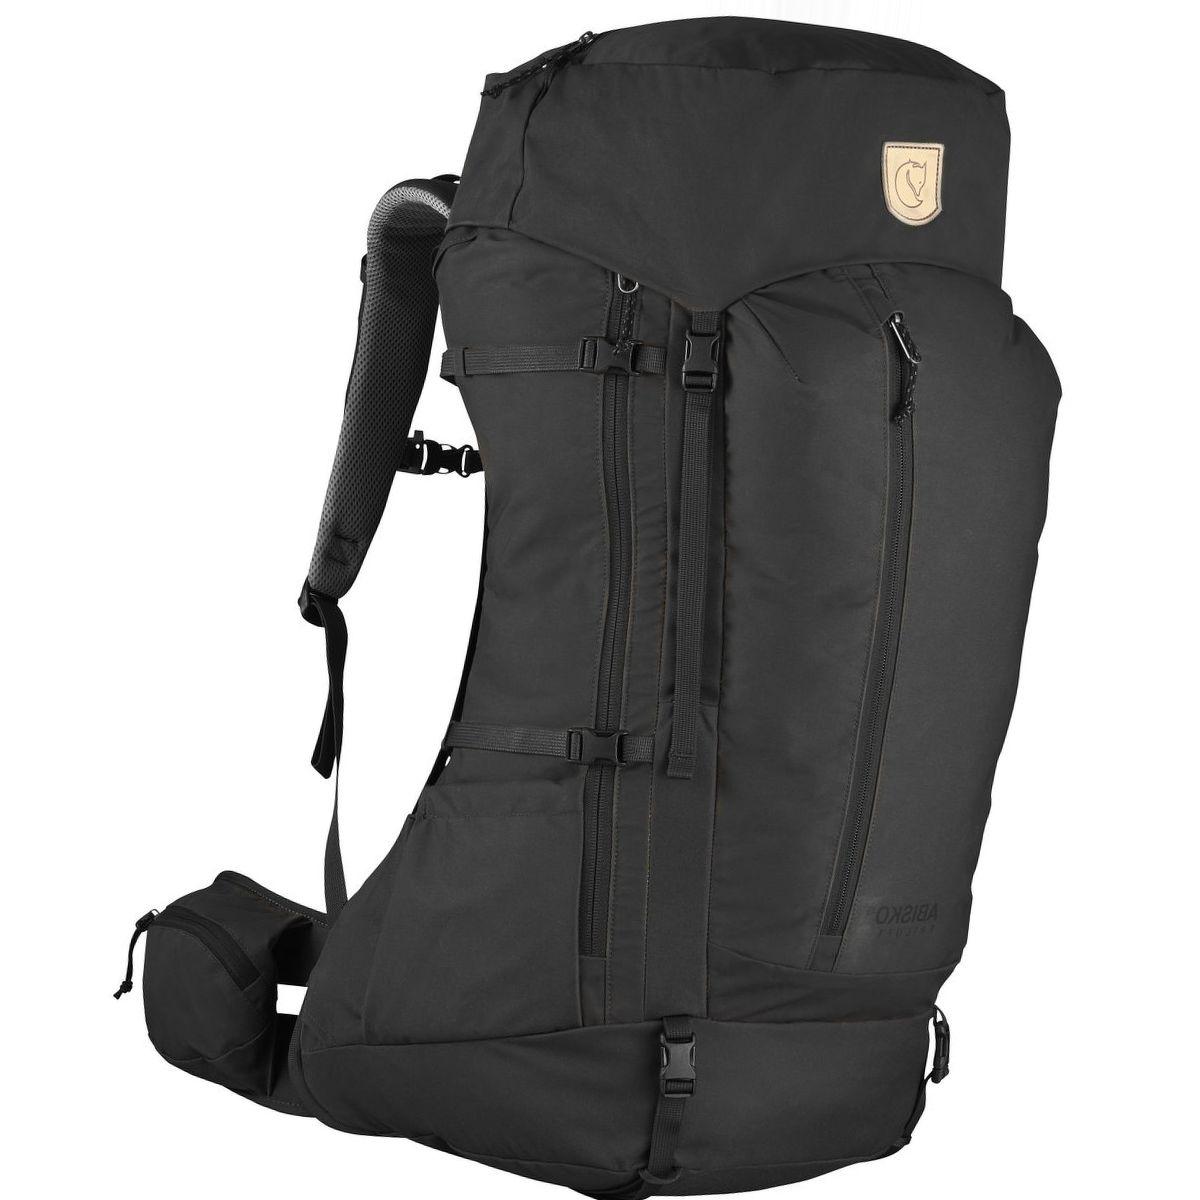 Fjallraven Abisko Friluft 35L Backpack - Women's